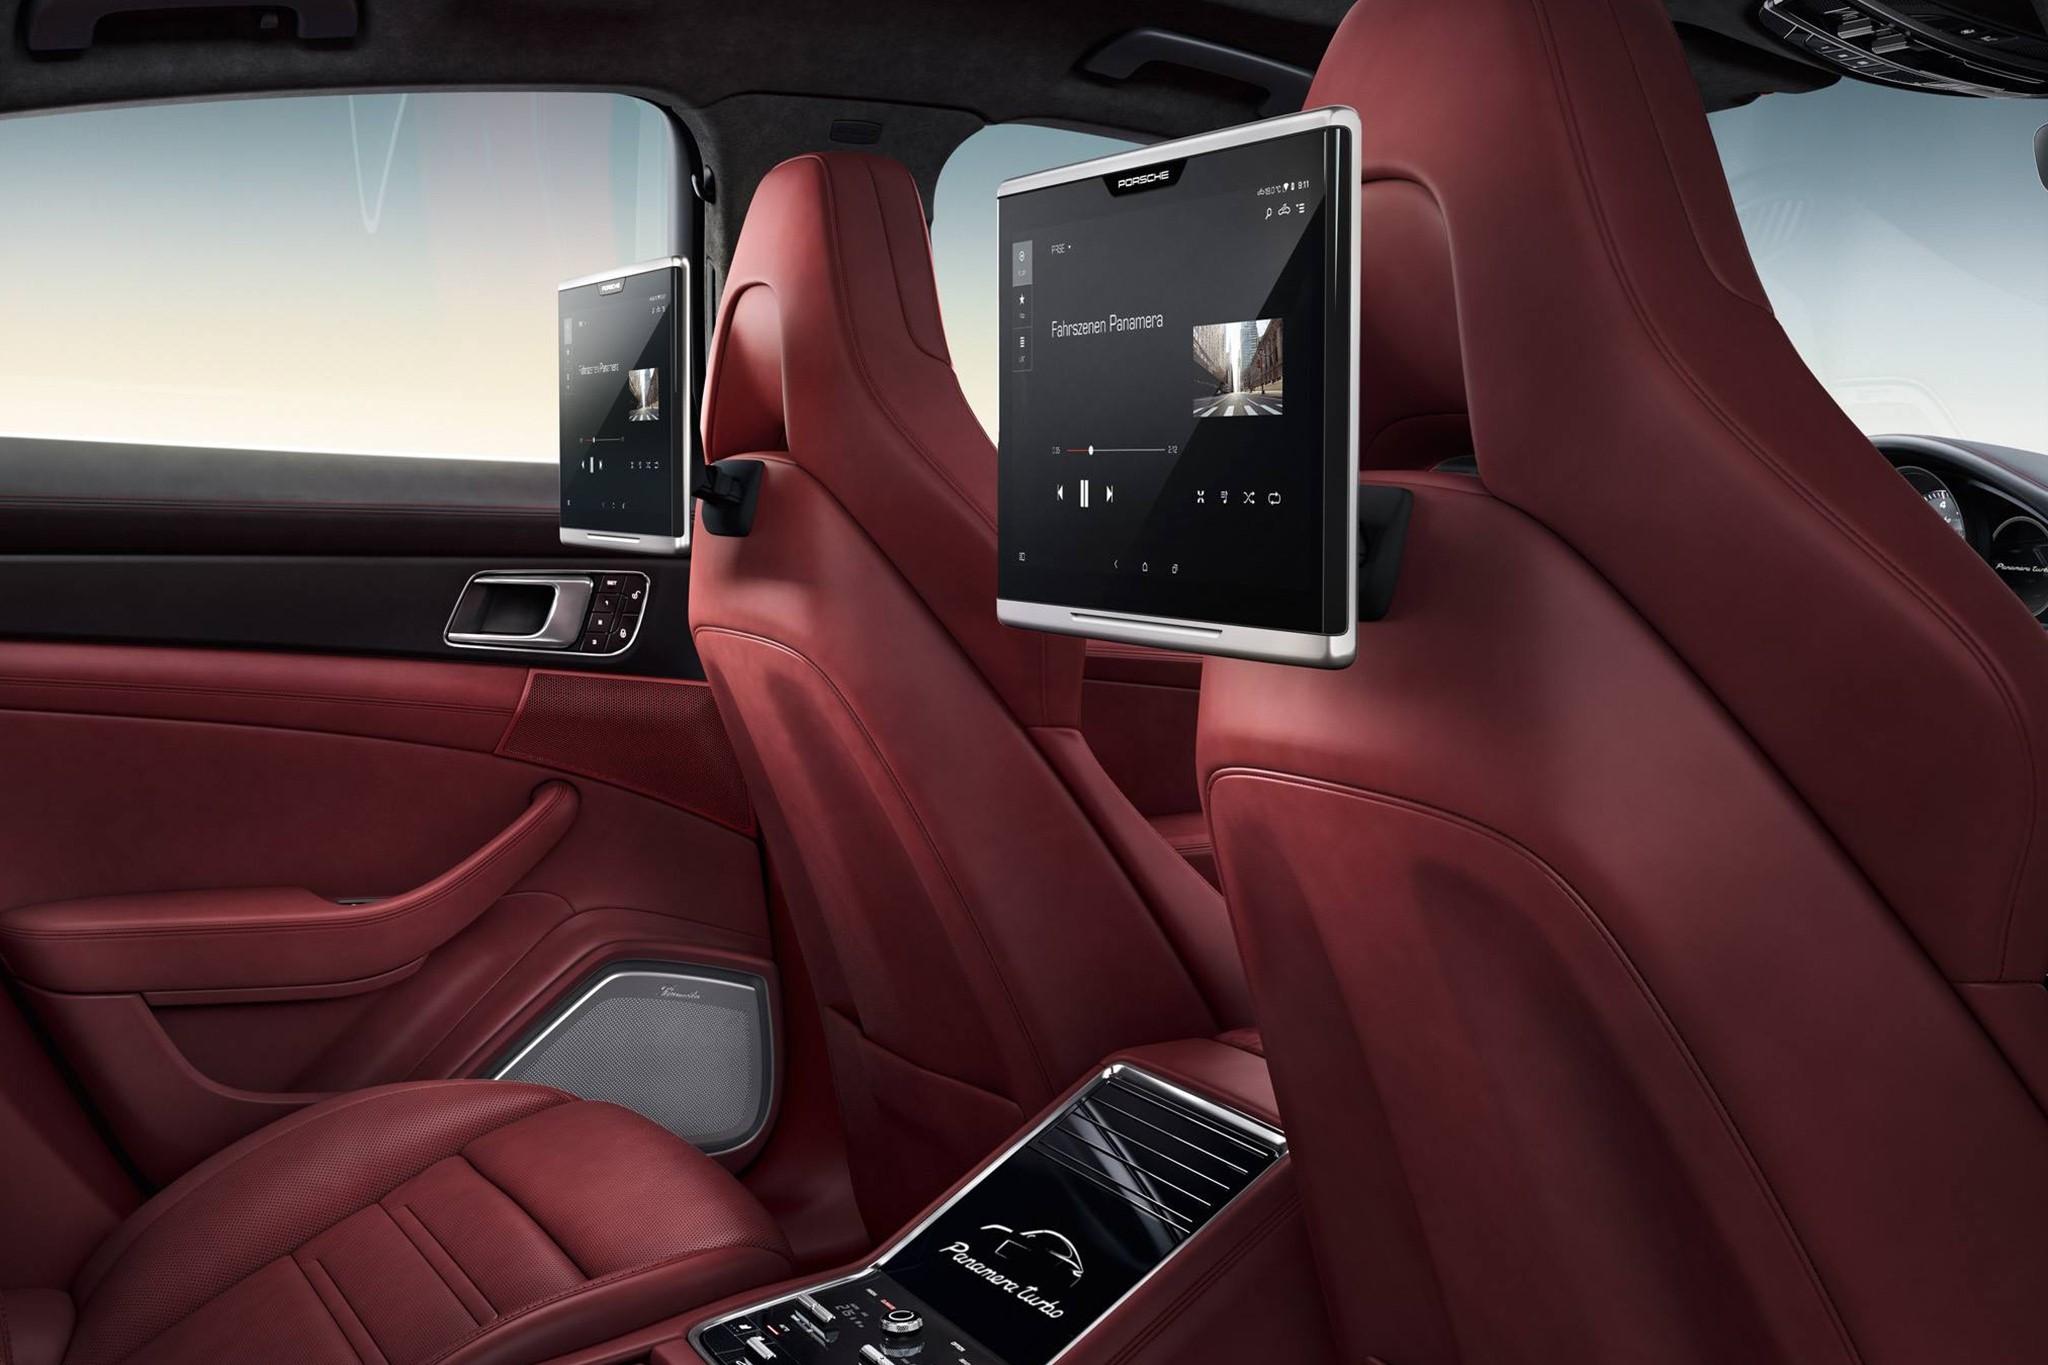 Porsche Panamera Windows Wallpapers